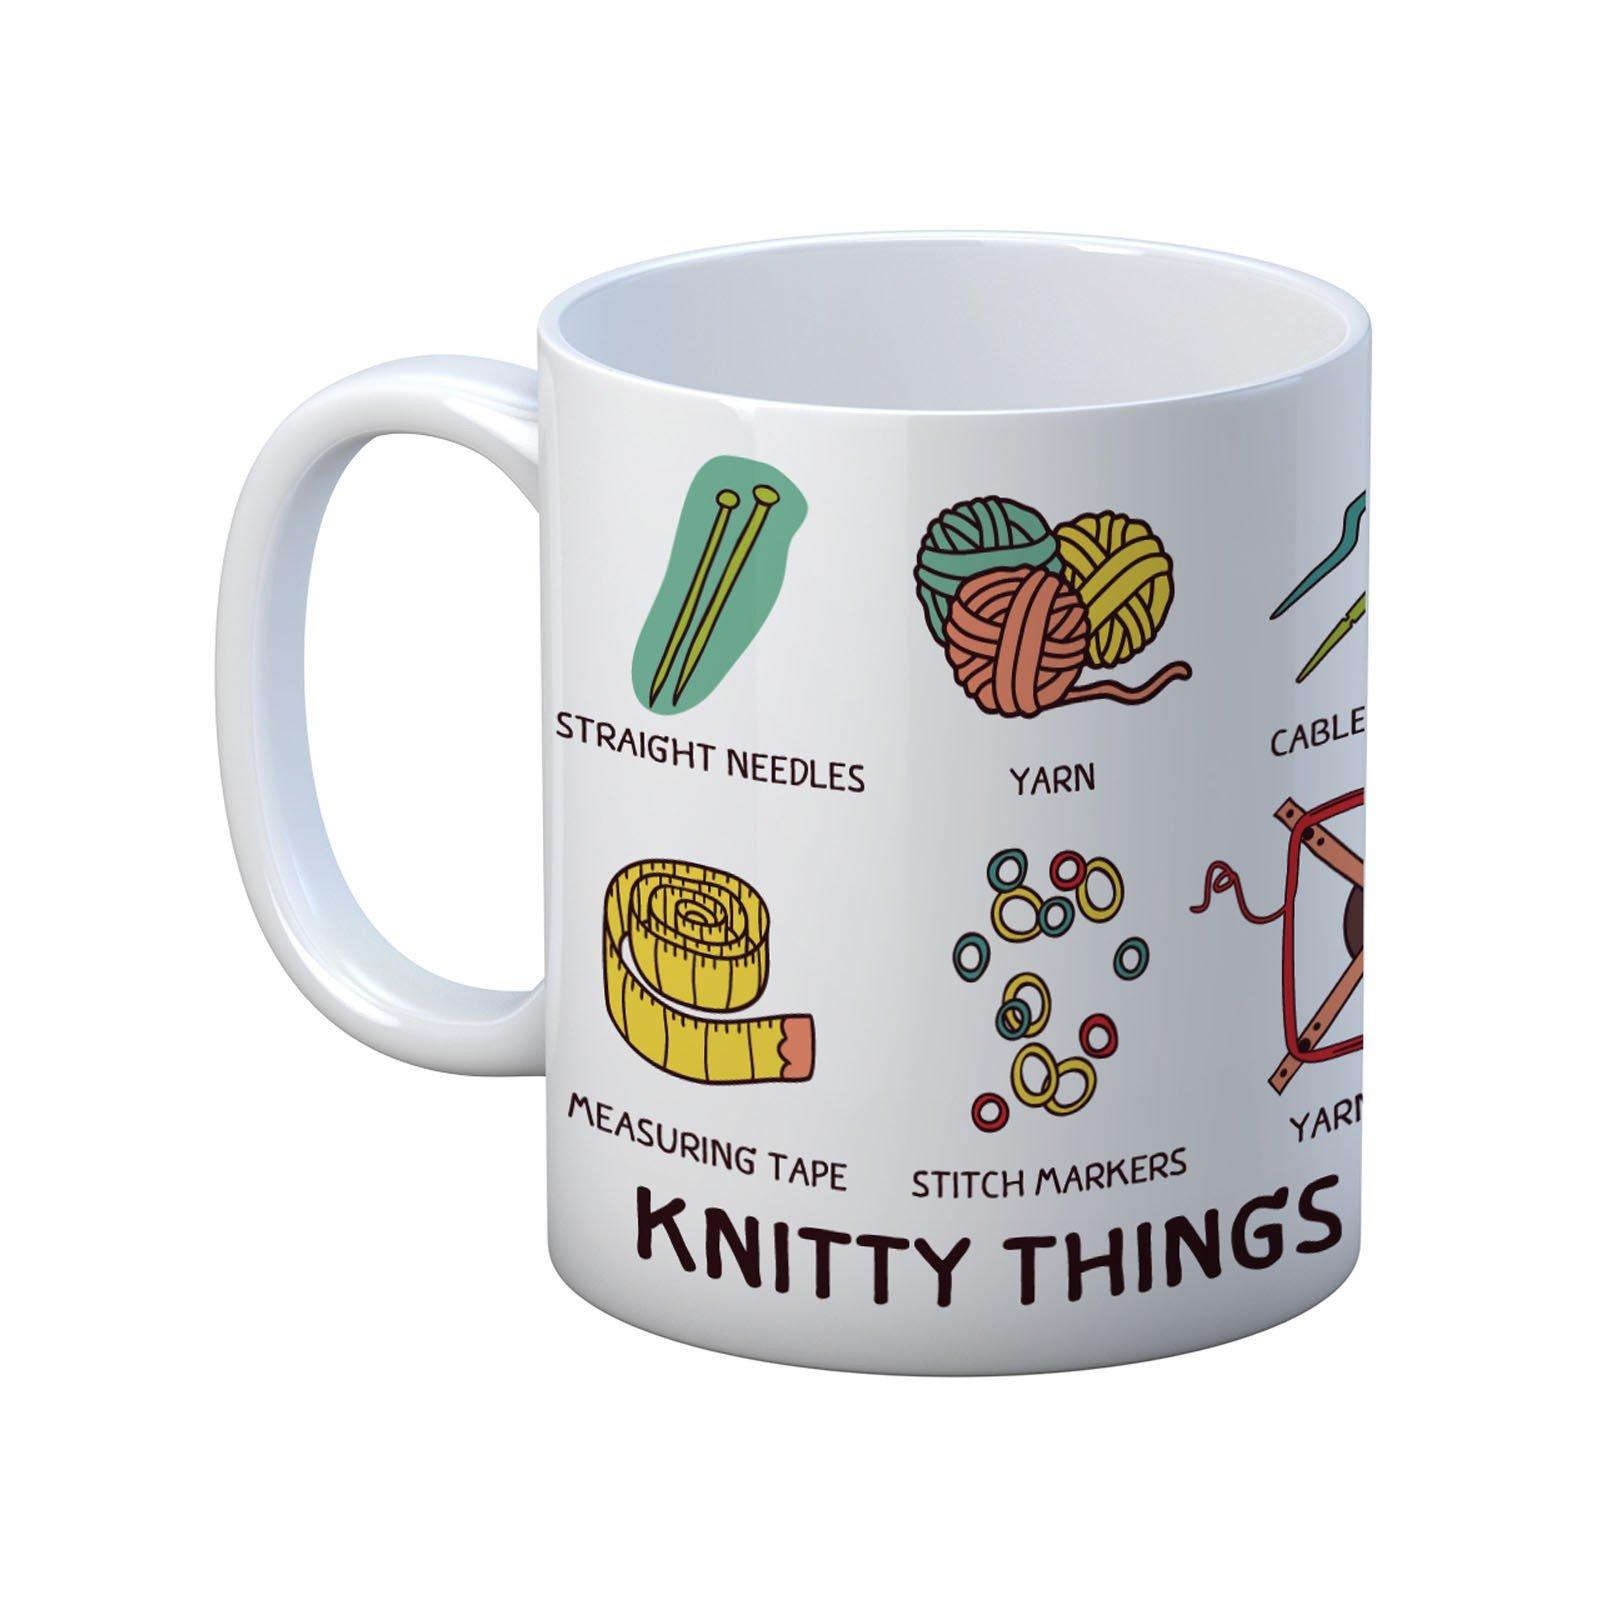 Knitty Things Mug